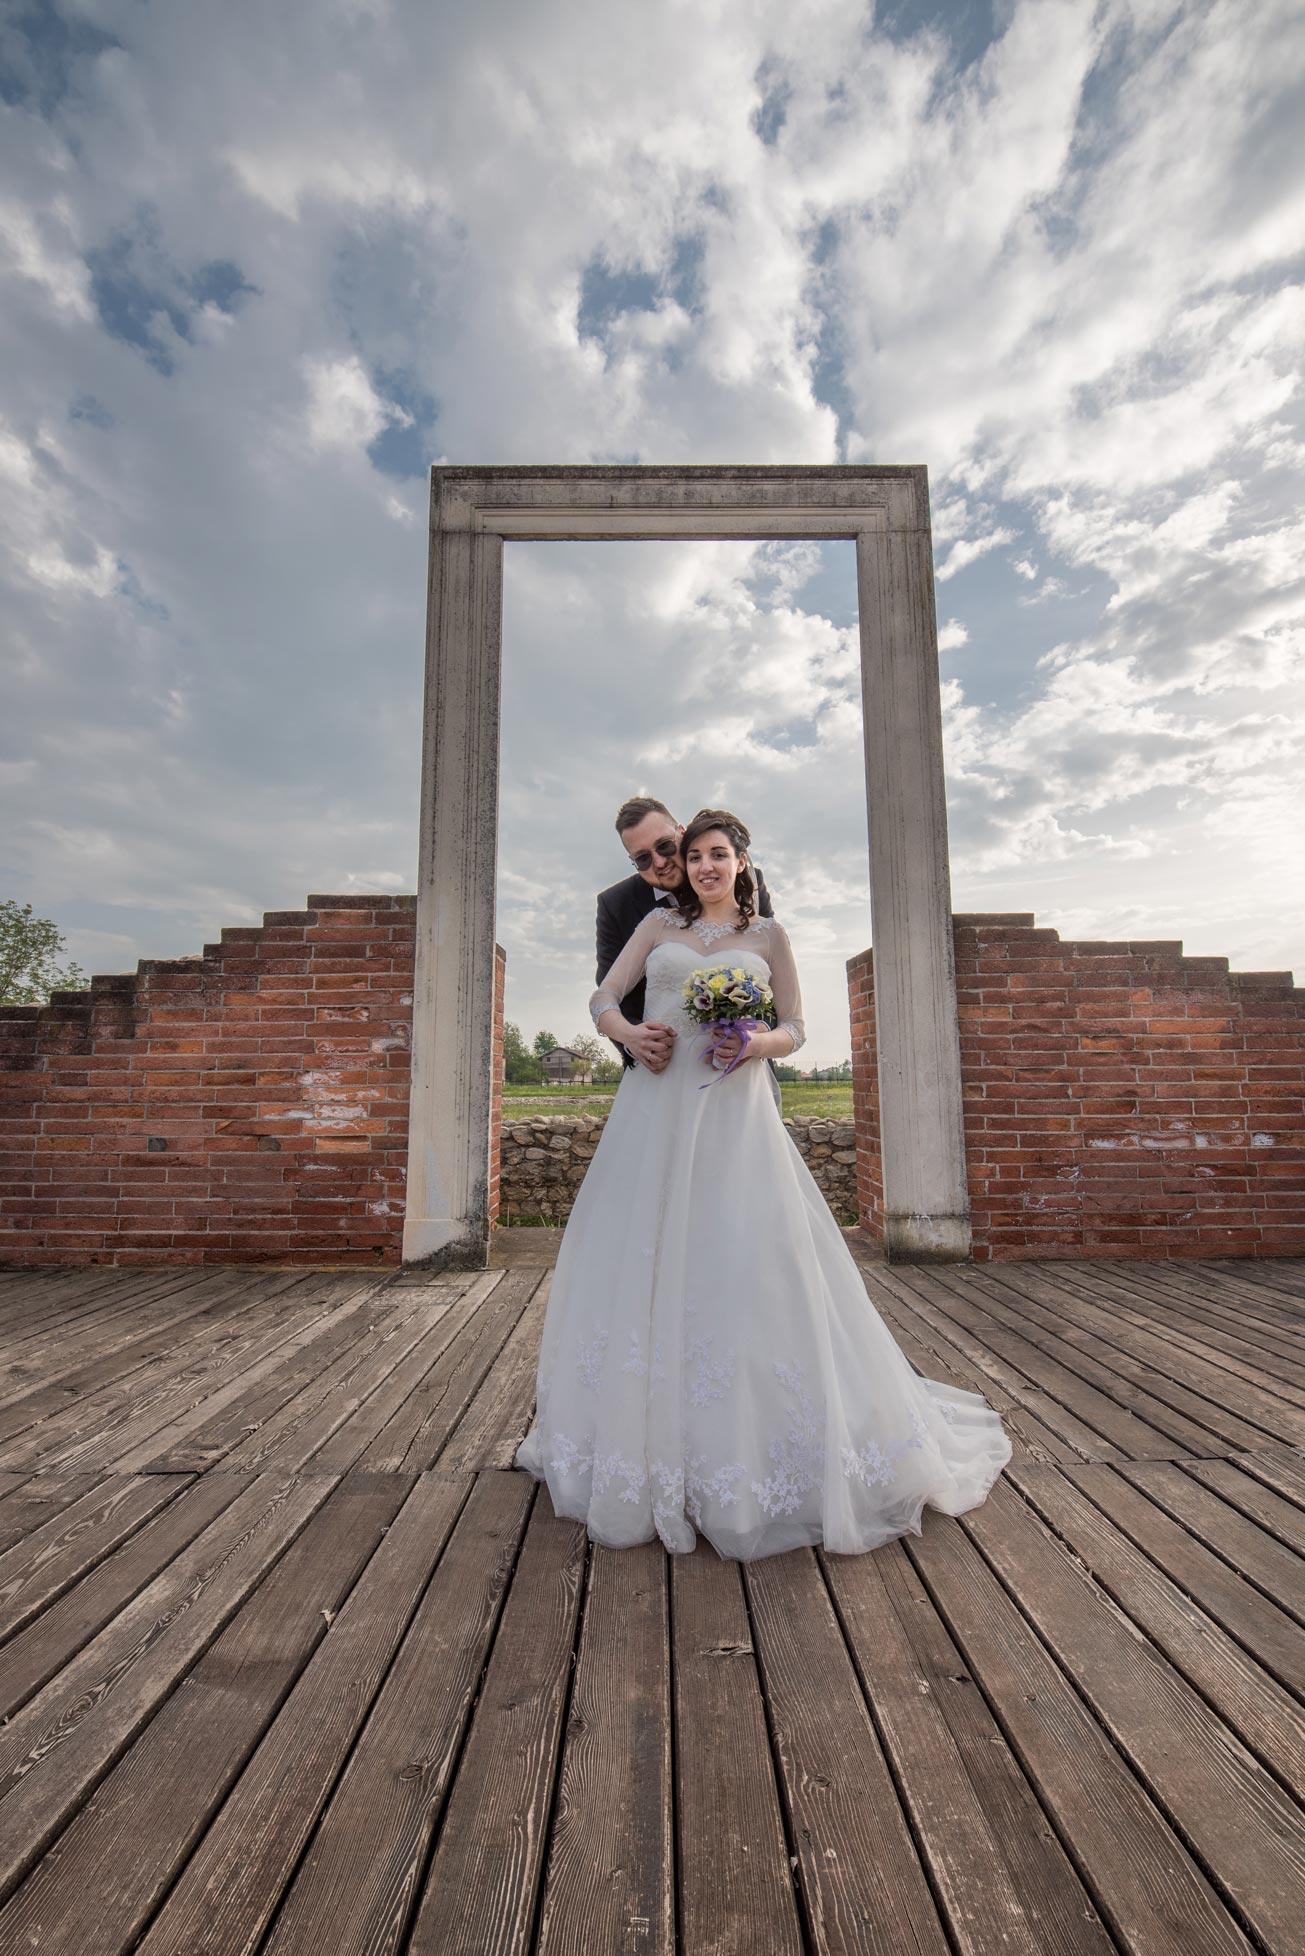 Matrimonio a Narzole Lorenza Diego - DSC 0679 - Servizio fotografico nel Roero - Servizio fotografico nel Roero